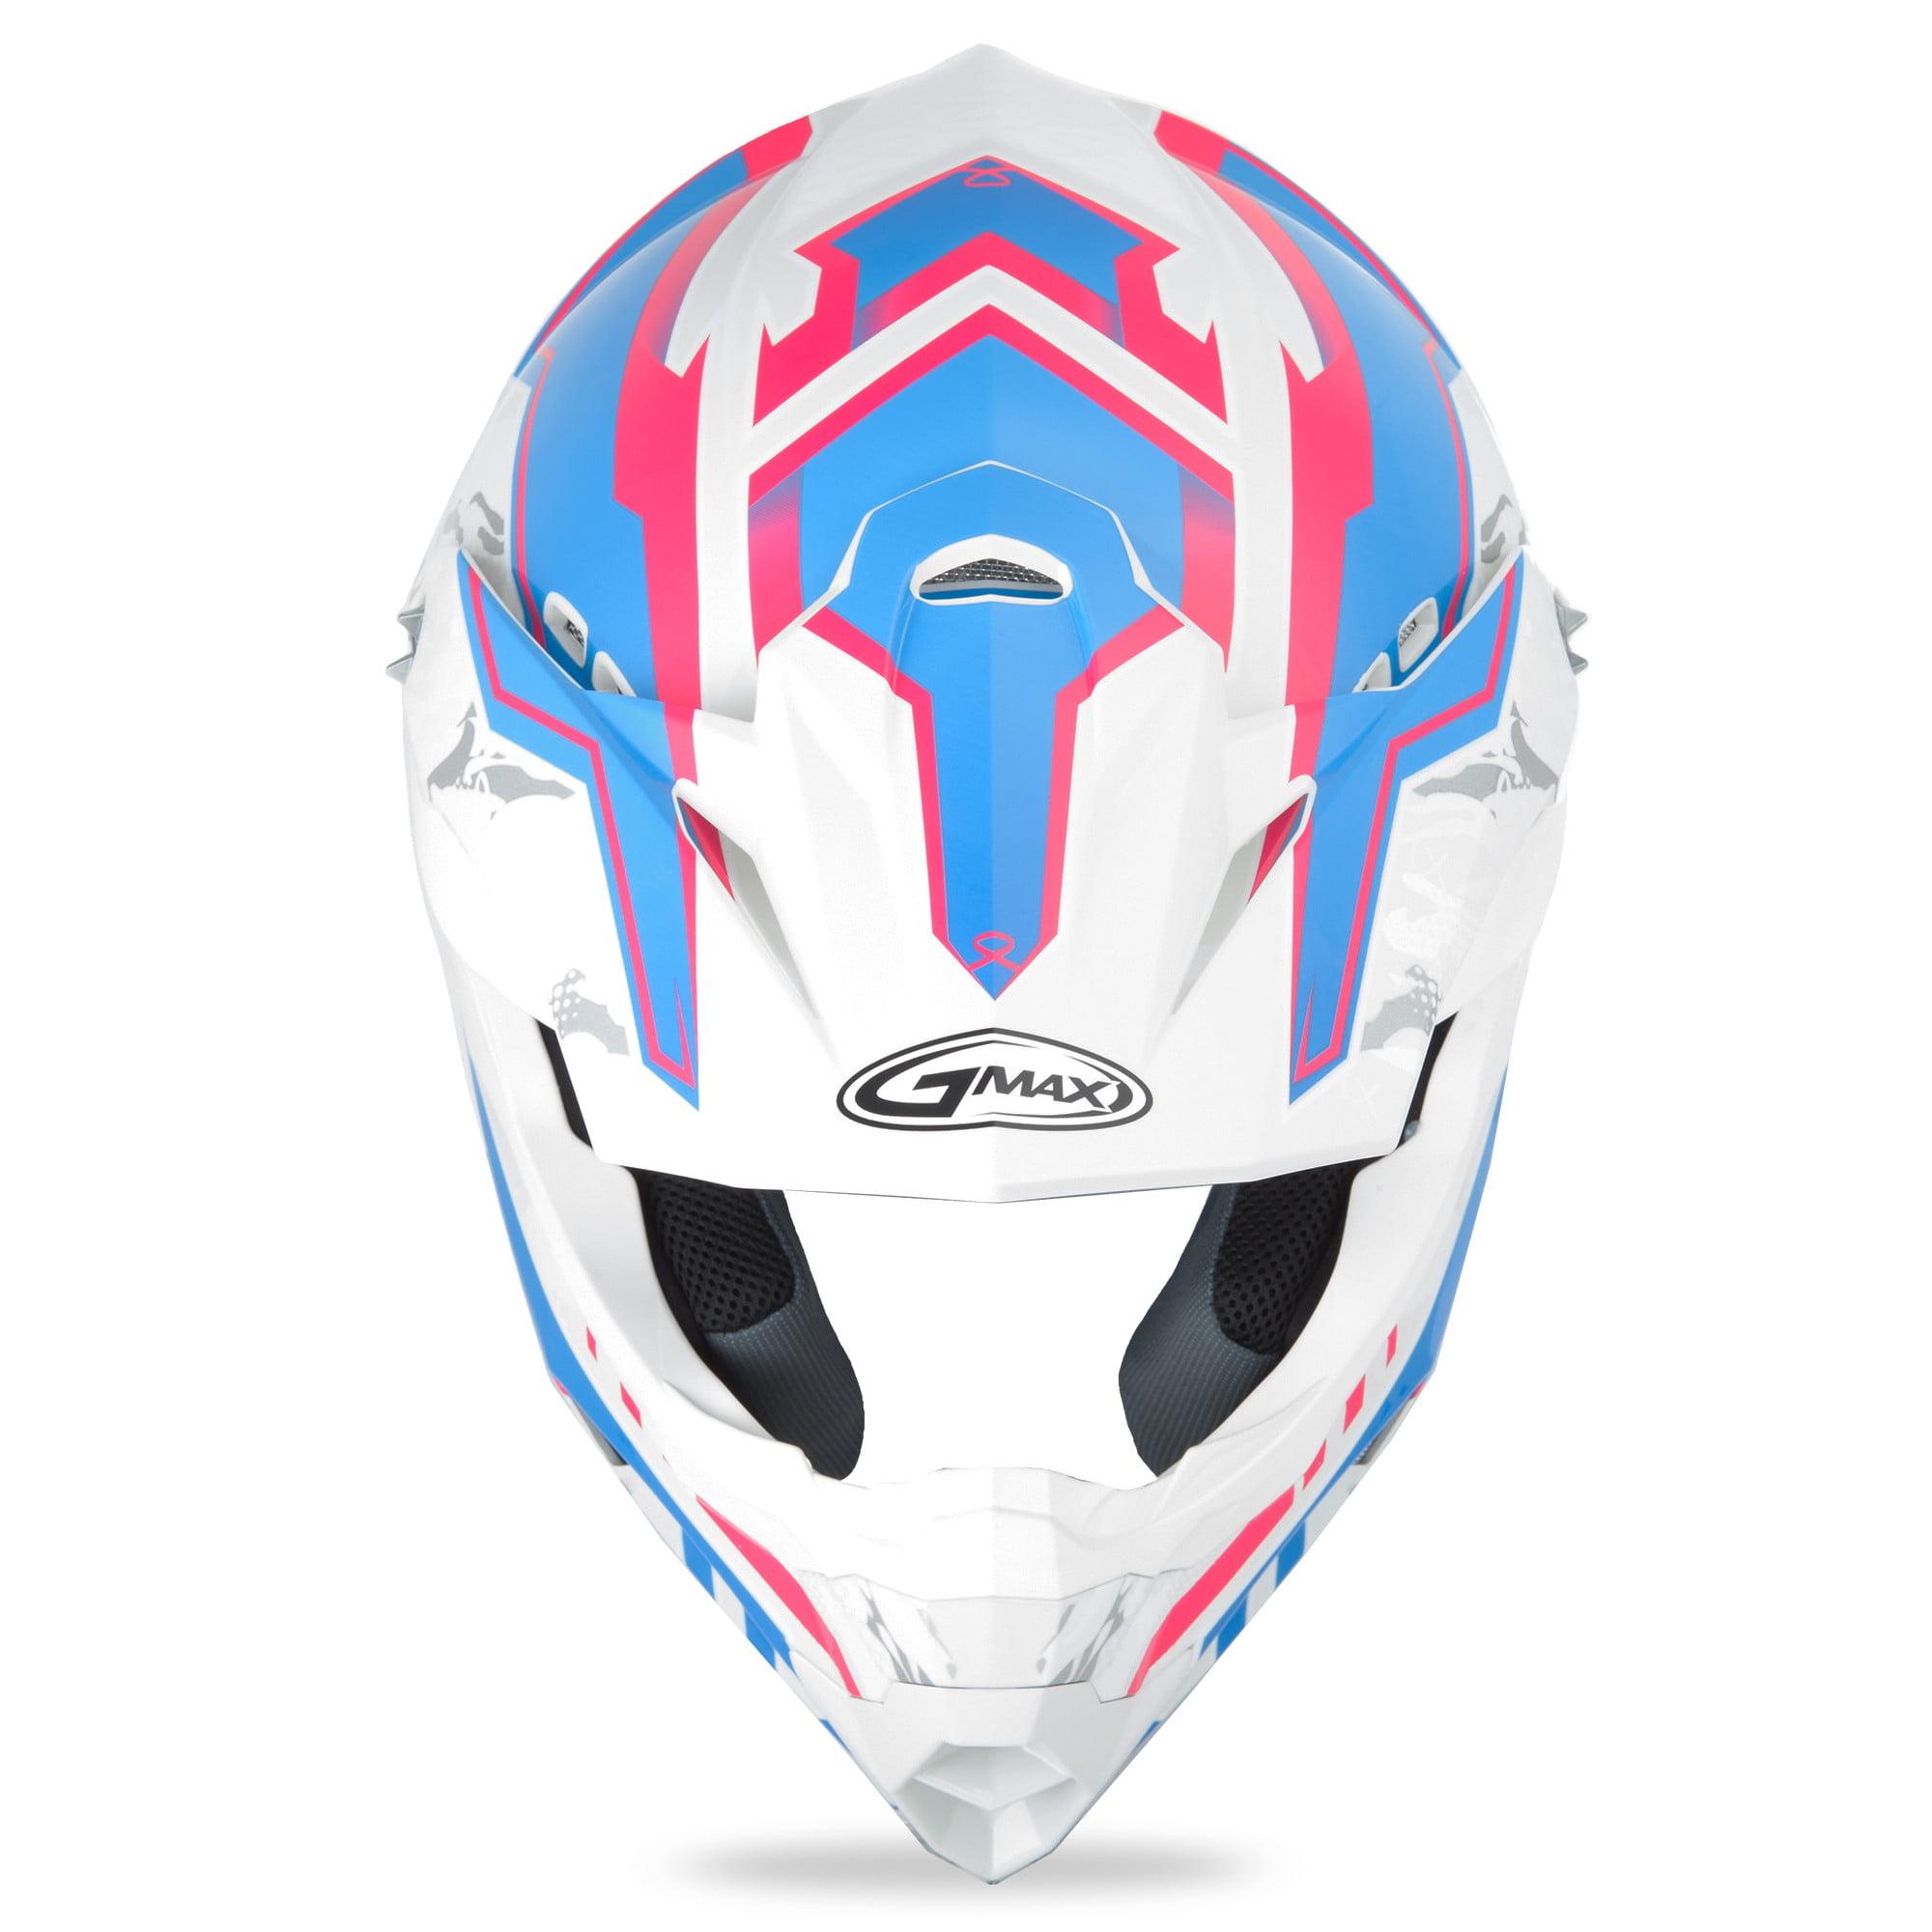 M//Medium GMAX MX86 Motocross Offroad Helmet Pink Ribbon Riders White//Pink//Blue